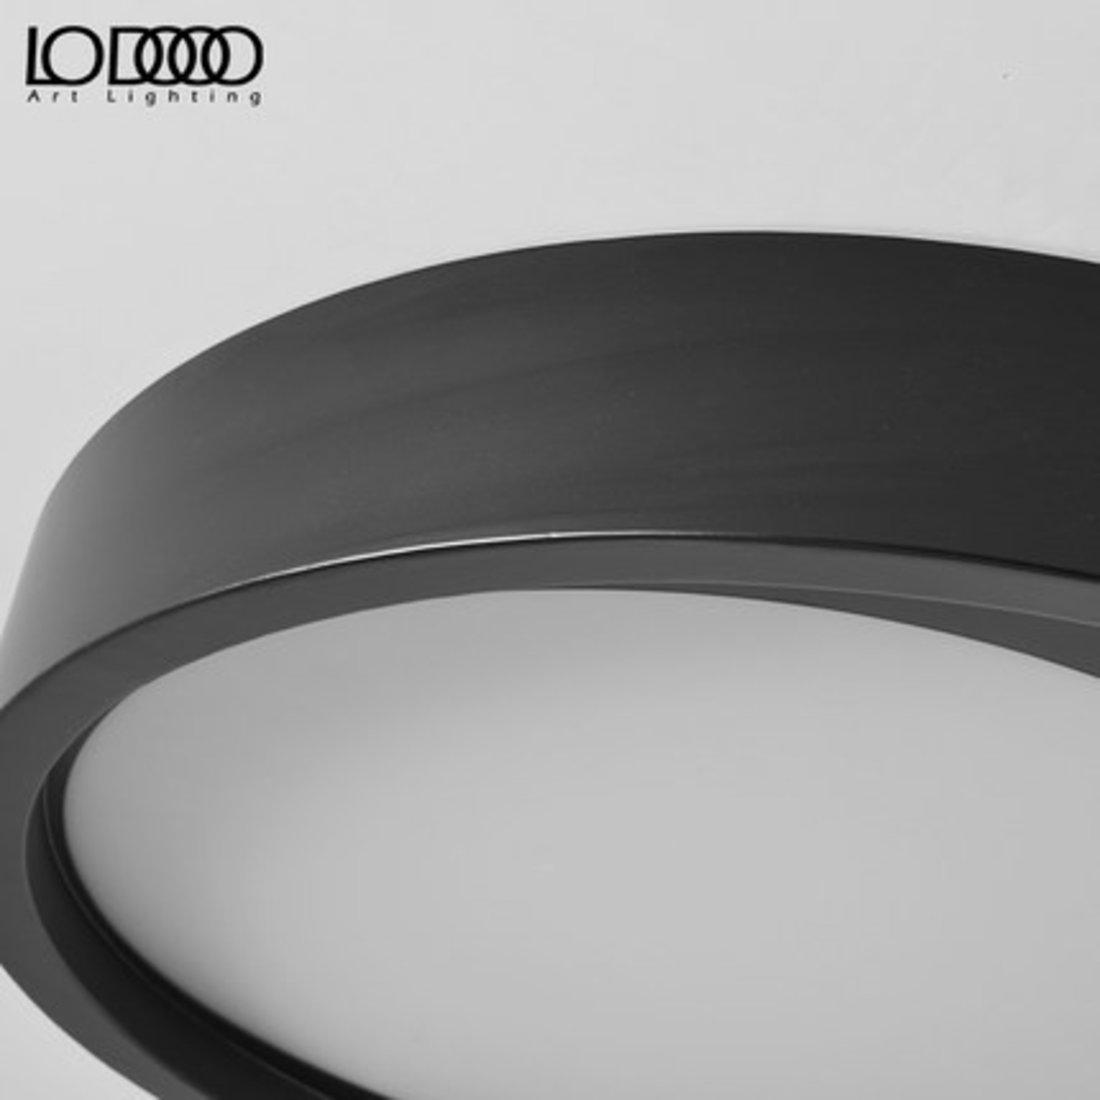 「led吸顶灯」现代简约大气温馨创意吸顶灯